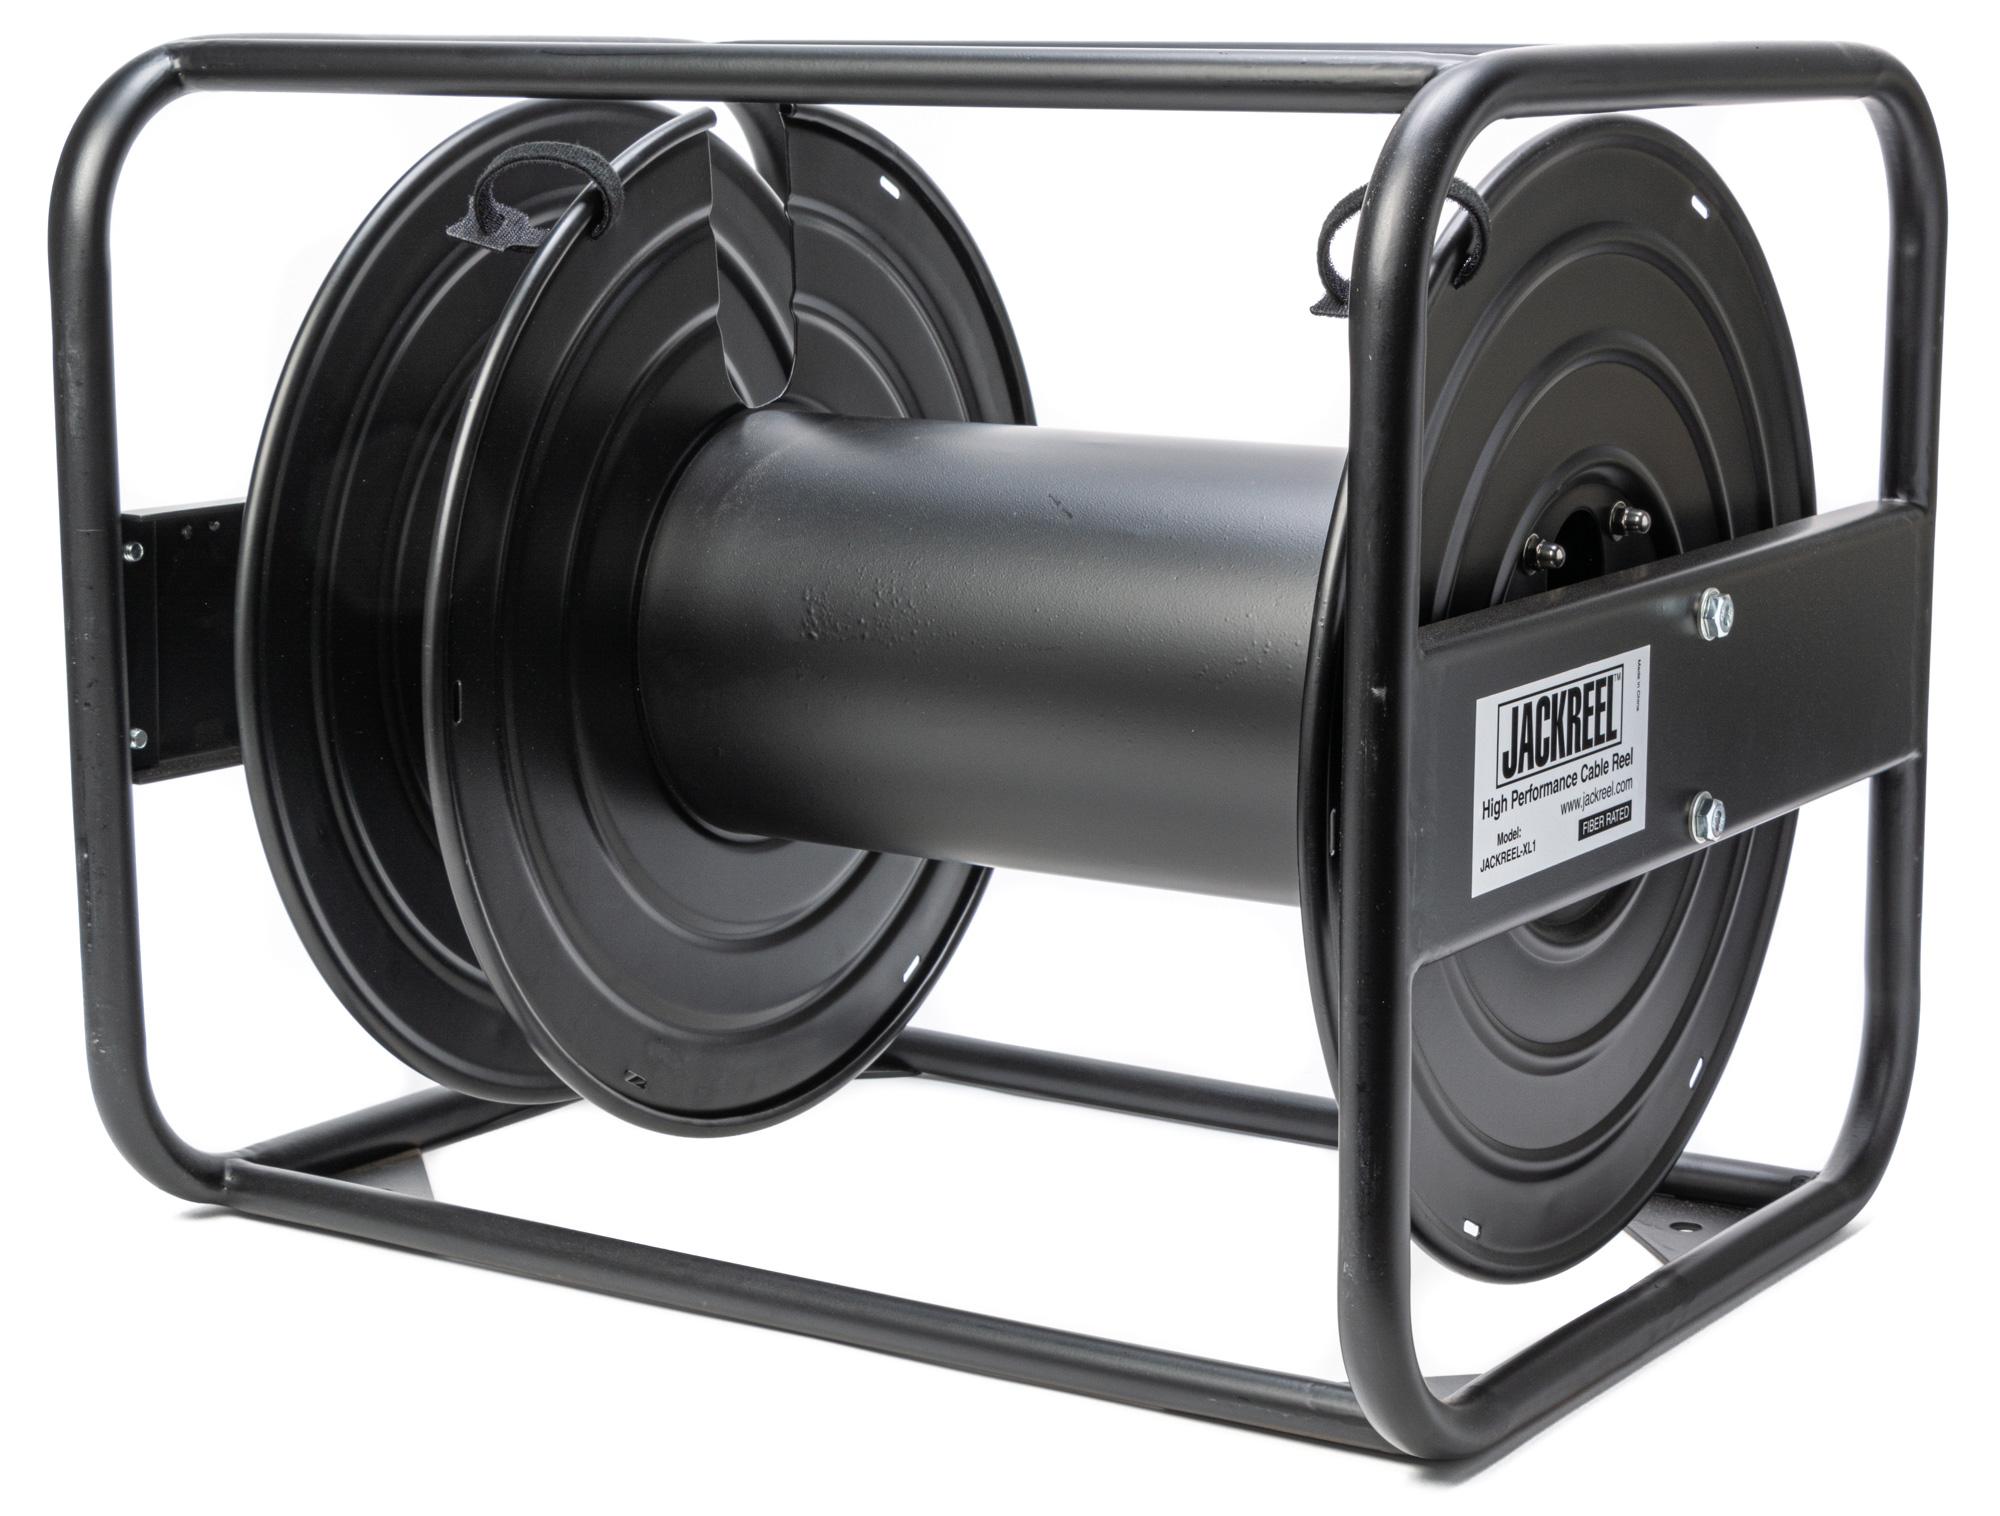 JackReel XL1 High Capacity Broadcast Cable & Fiber Optic Cable Reel - Bstock (Scratches/Box Damage) JACKREEL-XL1-BS